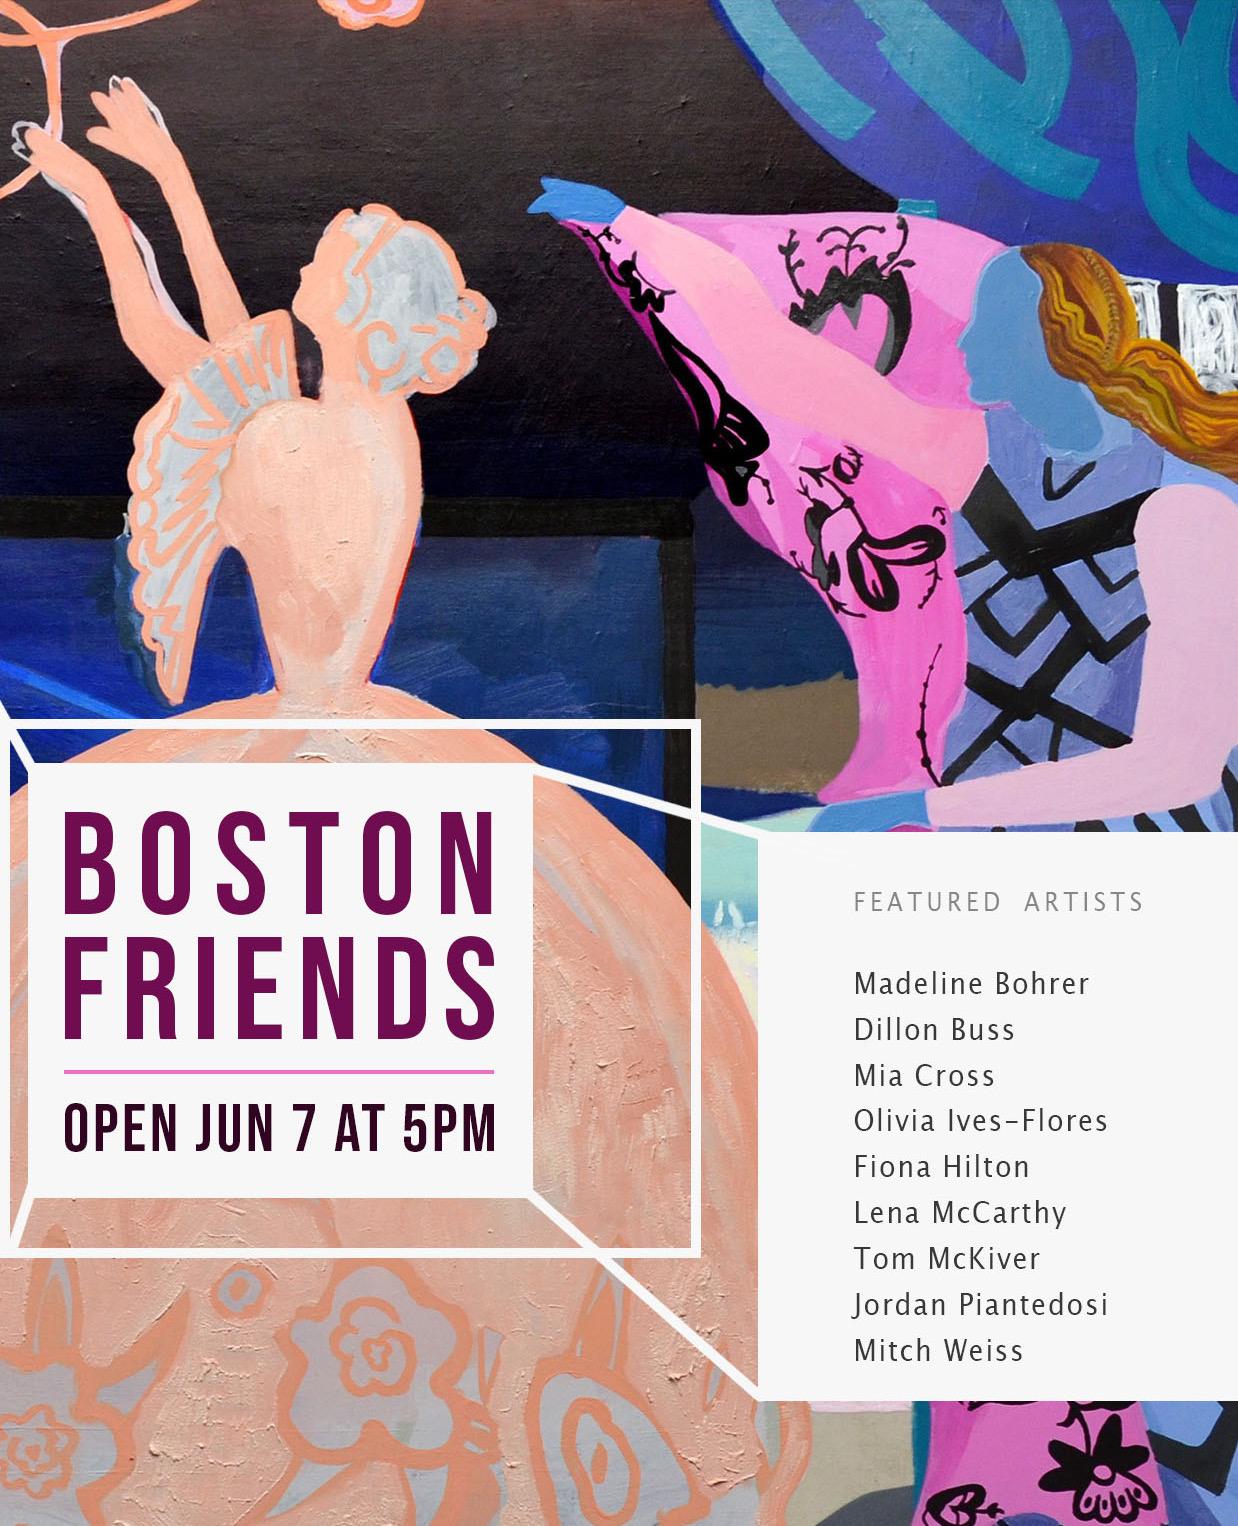 Boston Friends_June 7 at 5pm copy.jpg